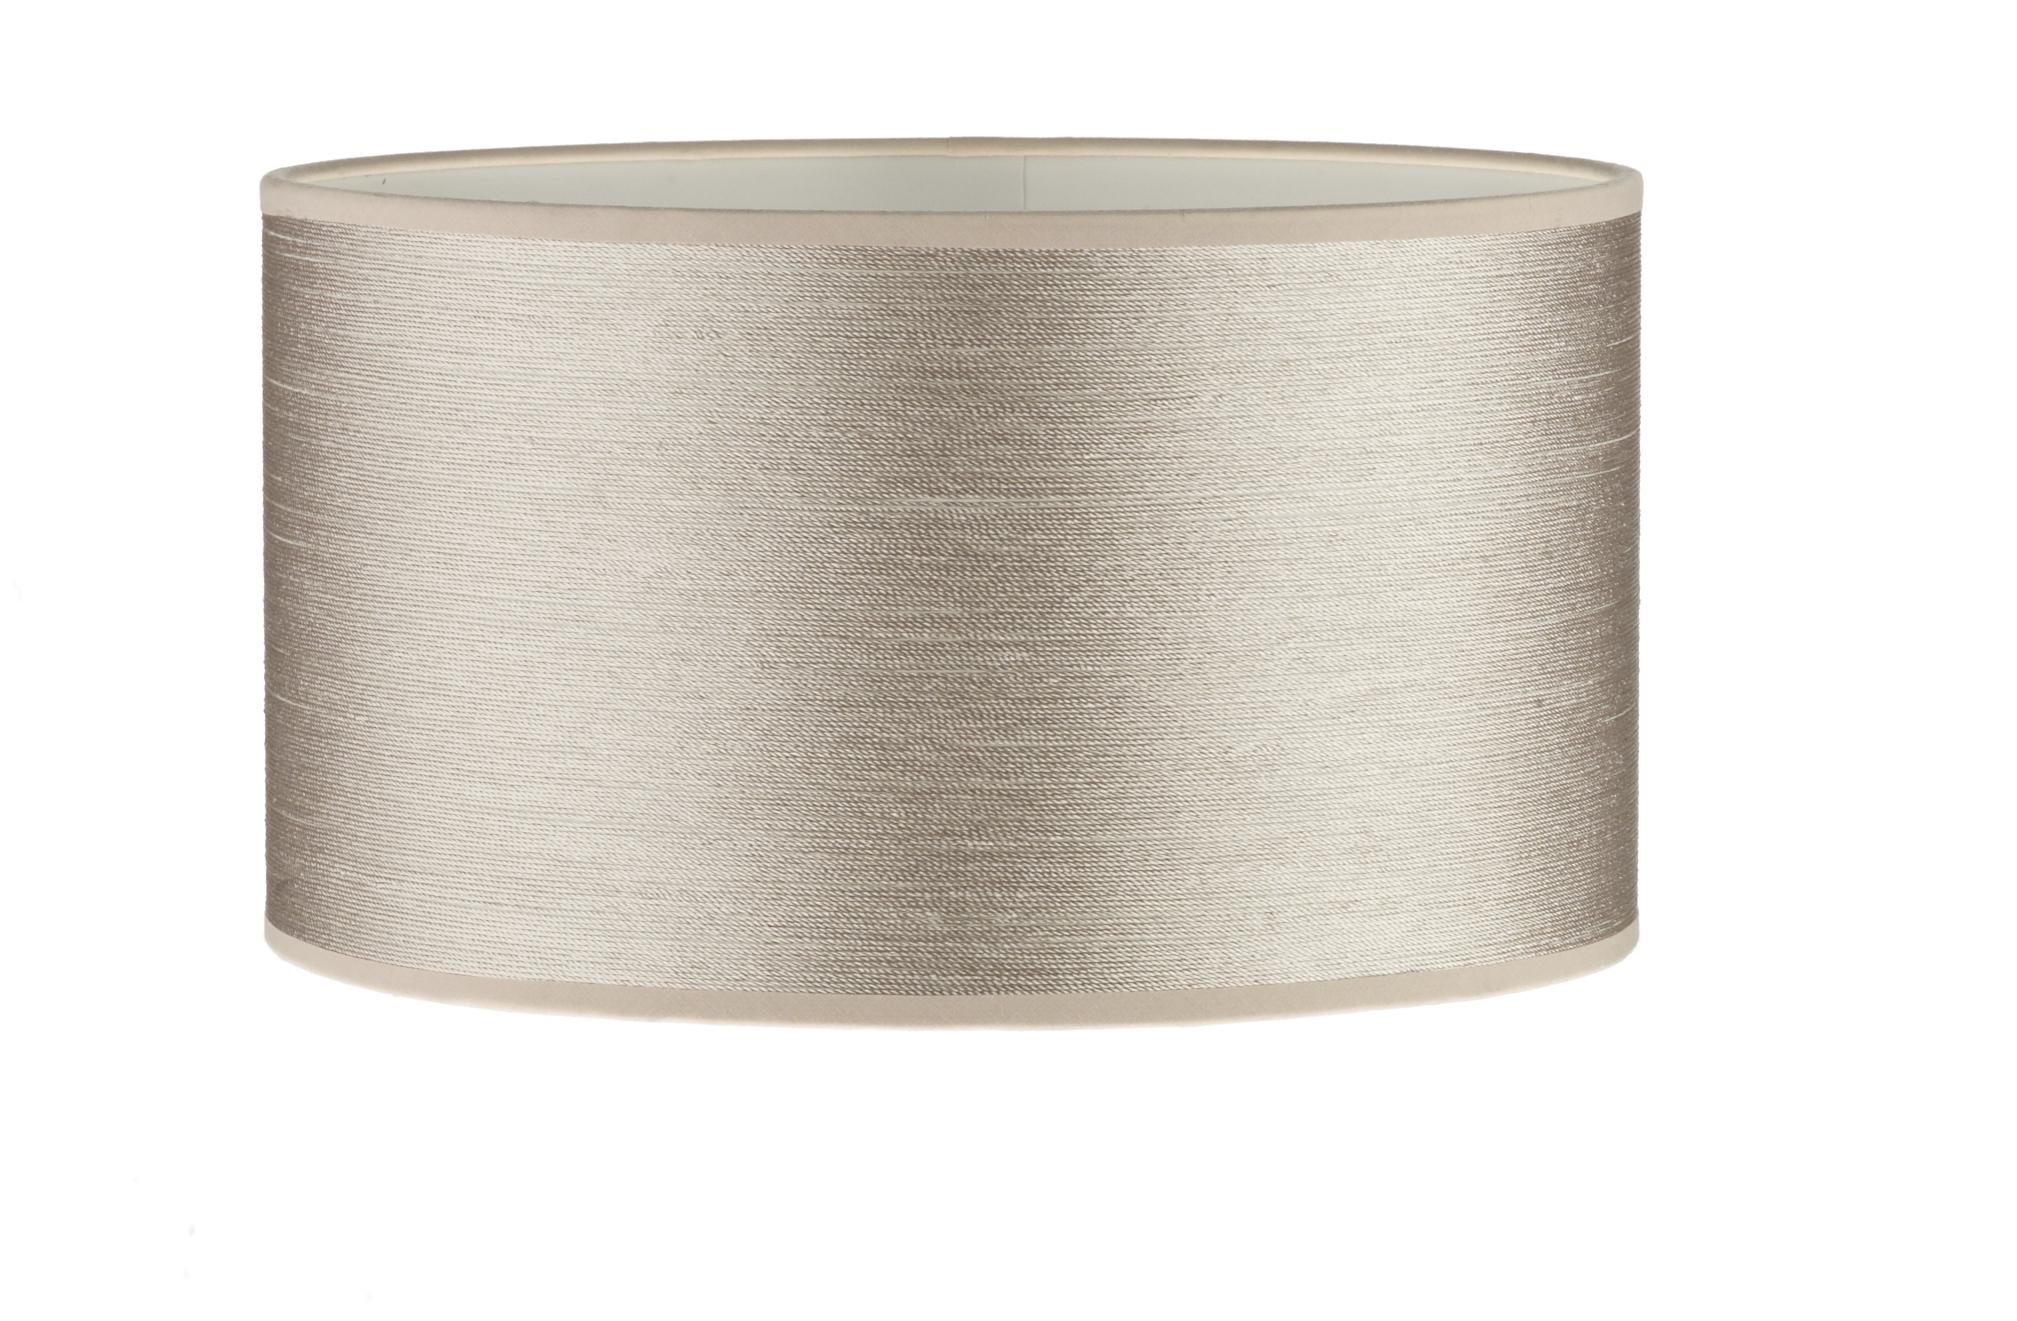 Surtee Stylish Round Table Lamp Shade | Lighting Design Online ...